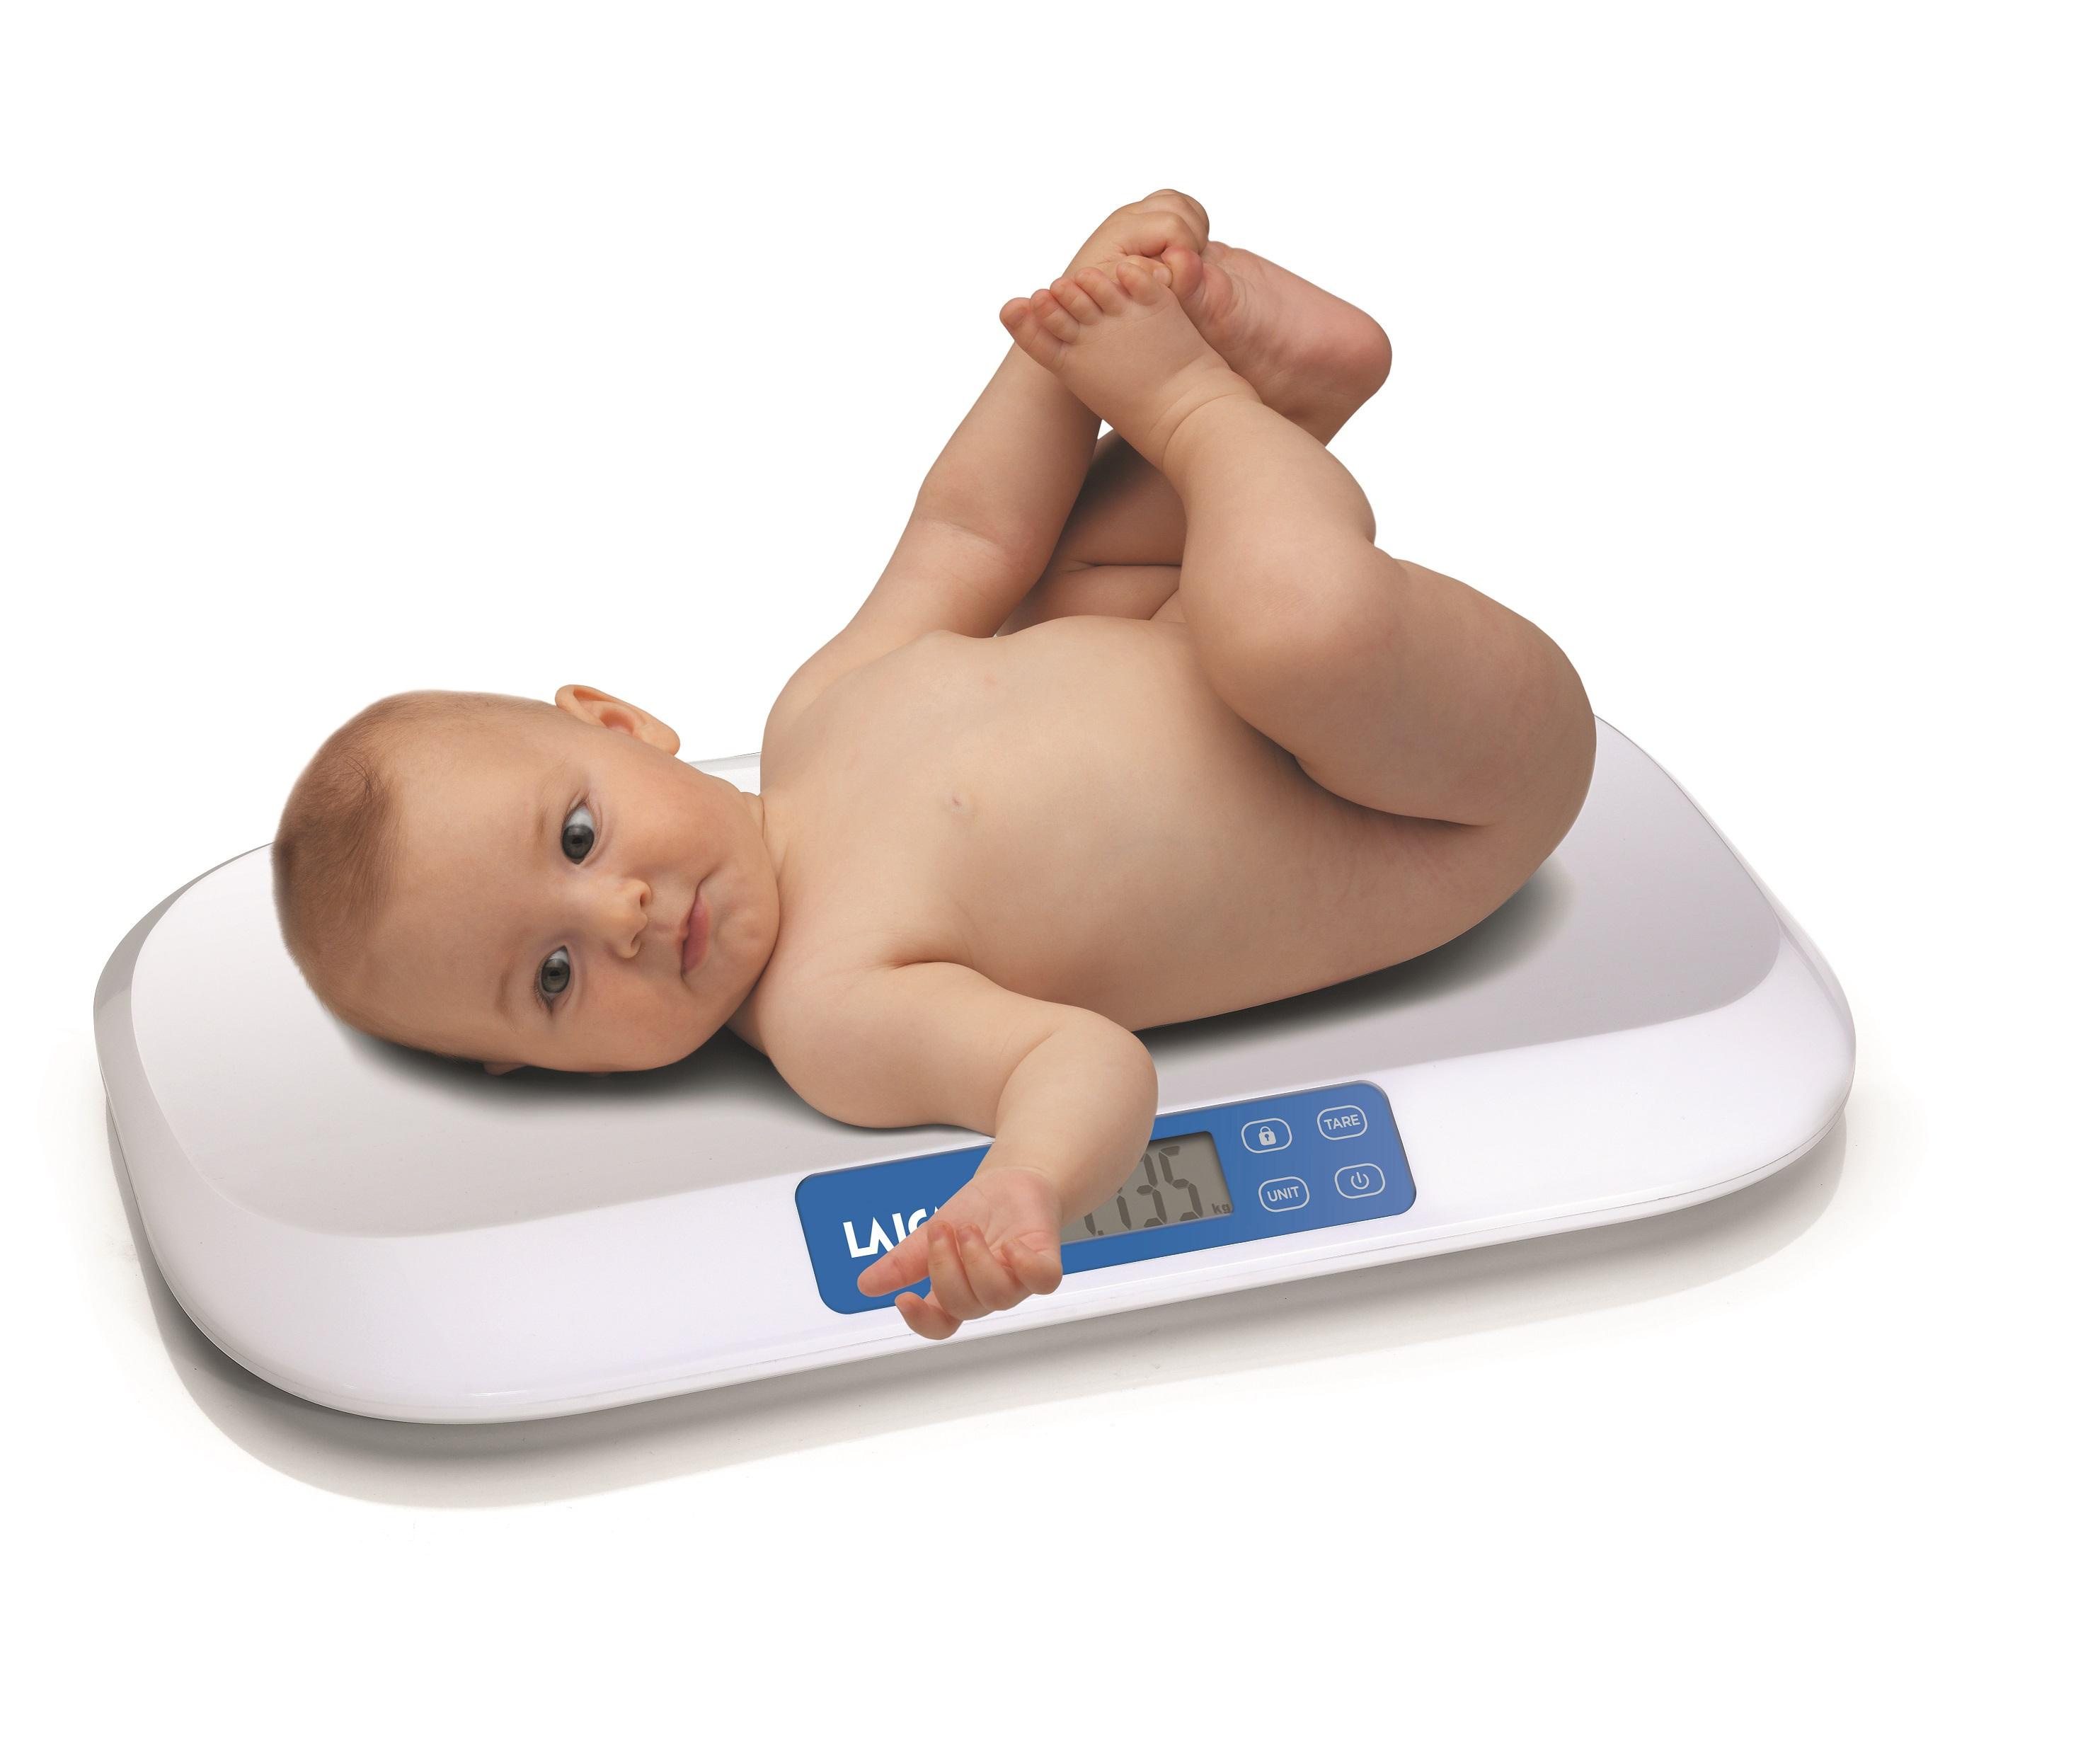 Cantar Smart pentru bebelusi Laica PS7030 laicashop.ro 2021